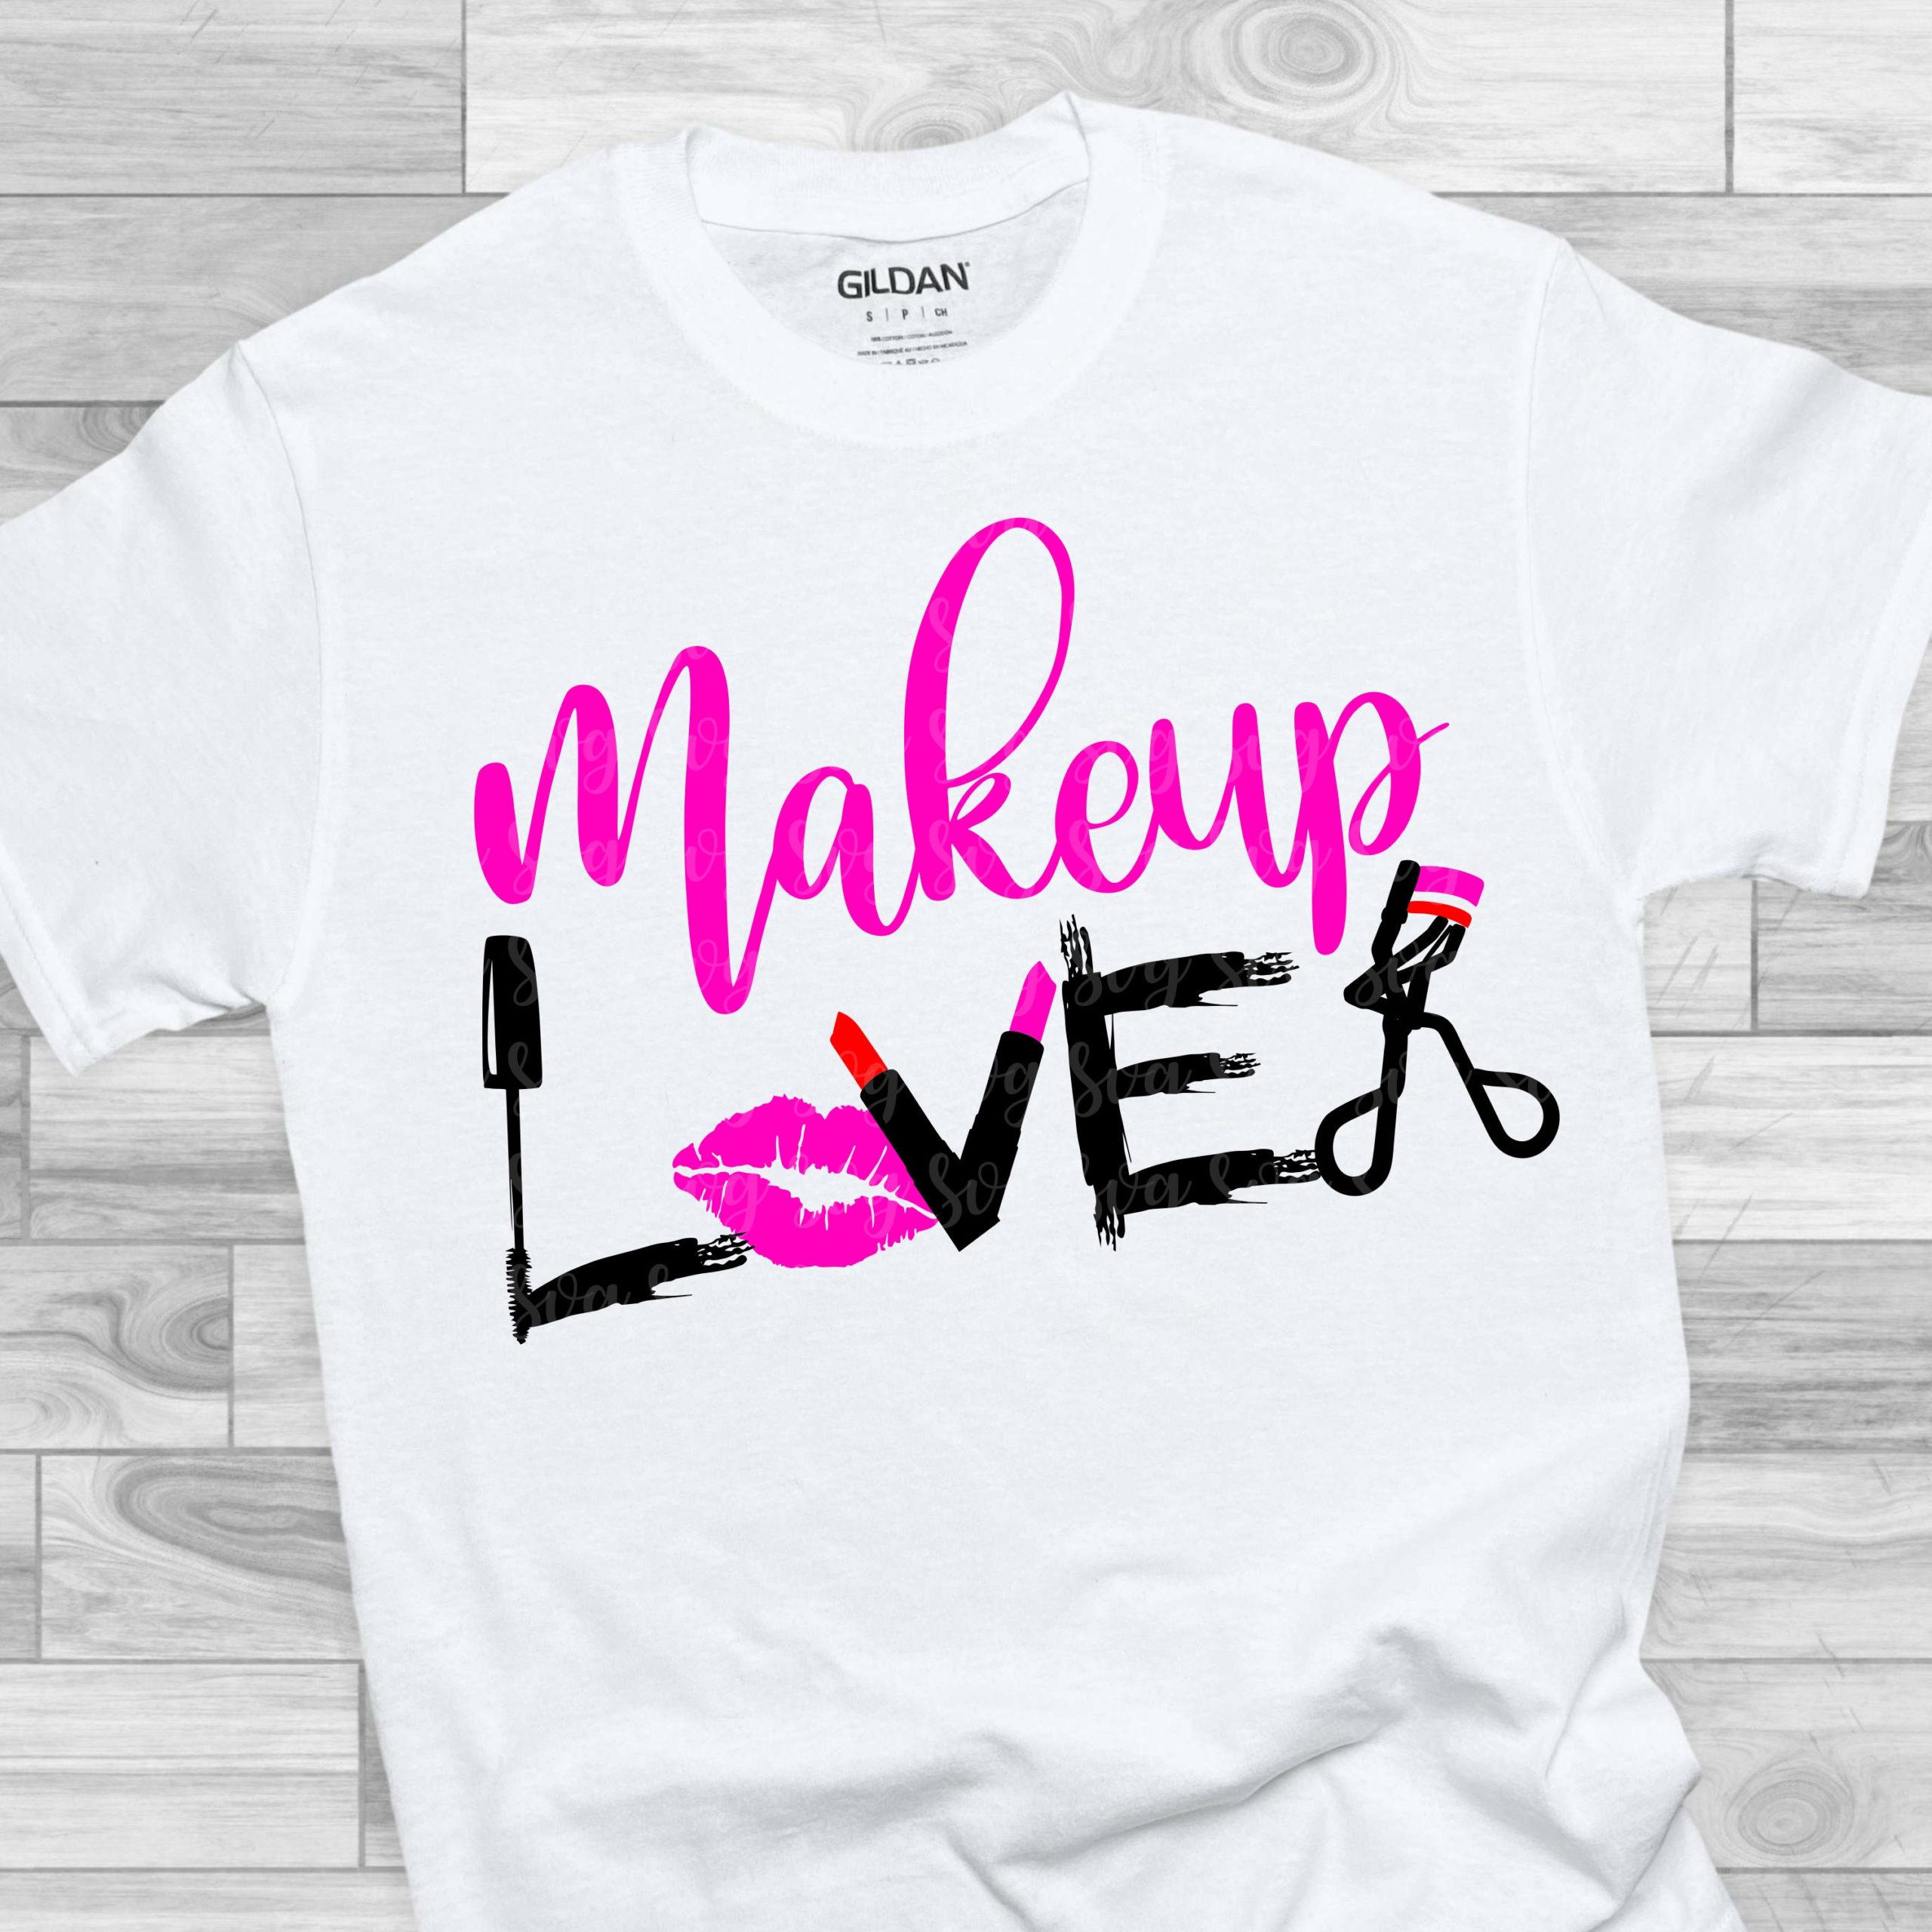 Make-up-lover-svglove-makeup-svgmakeup-shirt-svgmakeup-artistlipstick-svgmascara-svgcuttable-svg-designcuttable-cut-file-cricut-svg-60512e73